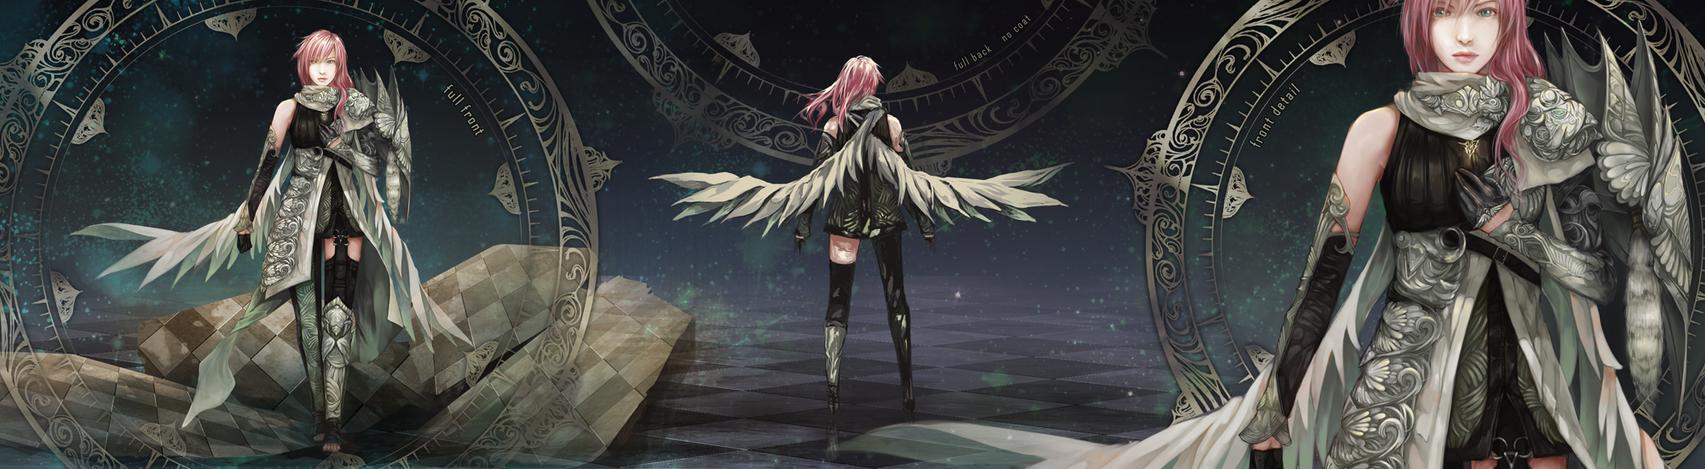 LR Contest - Angel of Valhalla by Nyanfood